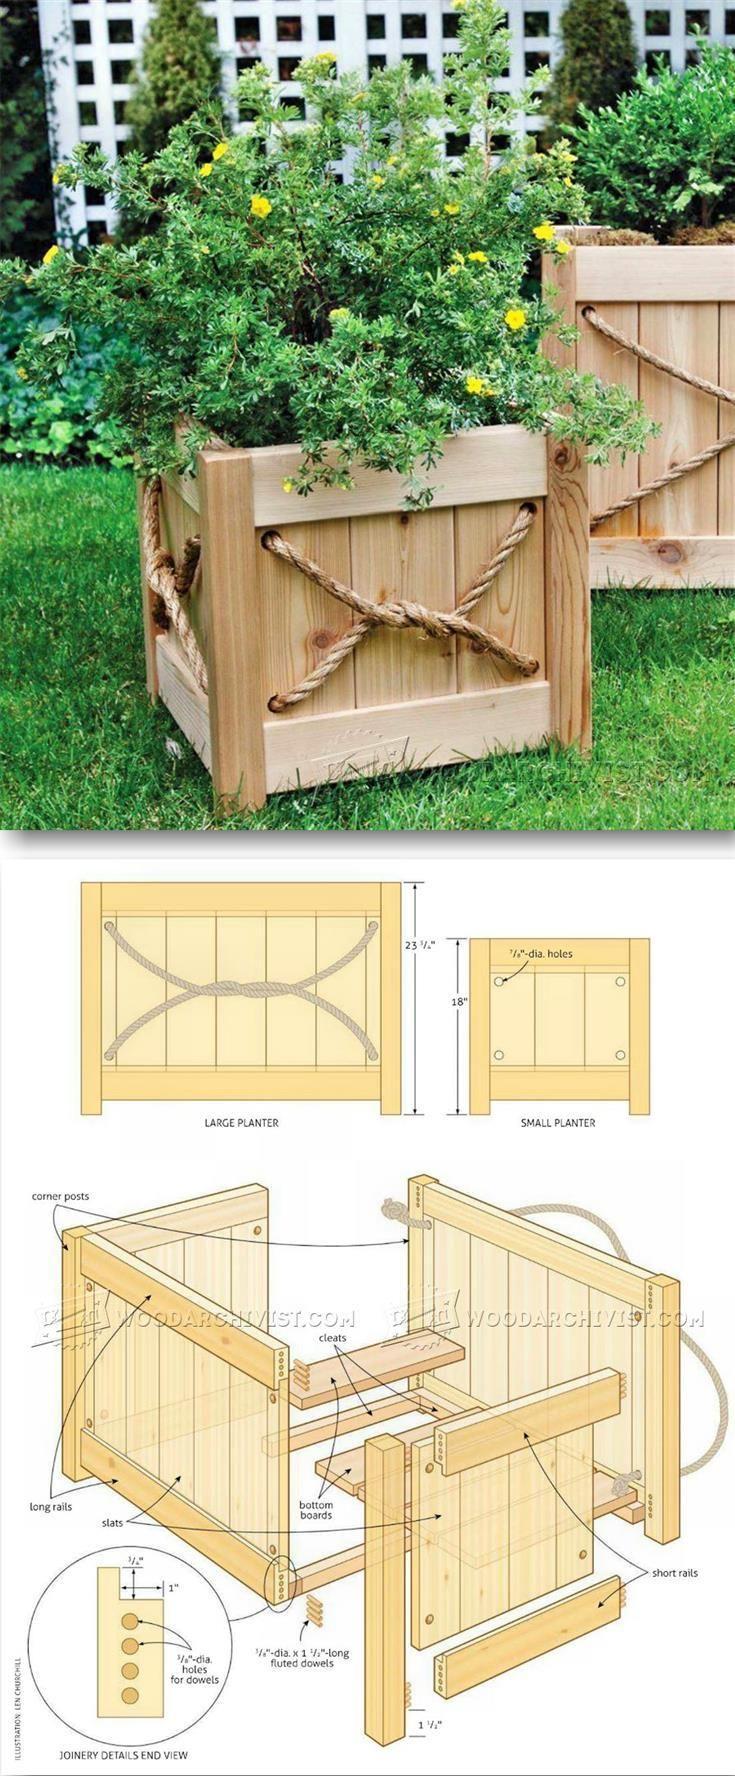 cedar planter plans outdoor plans and projects woodarchivist